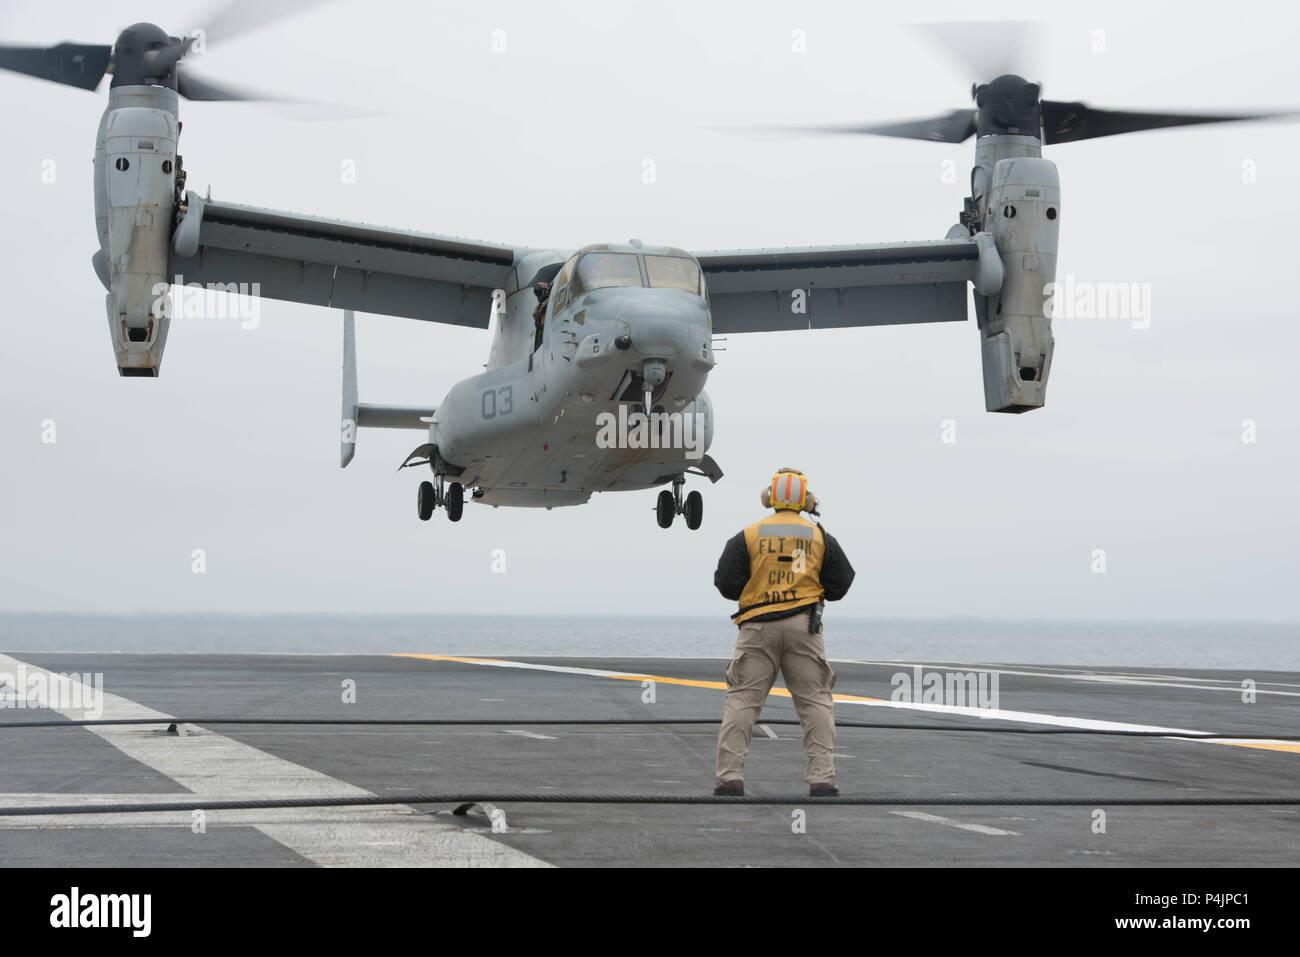 180620-N-GU969-0090  PACIFIC OCEAN (June 20, 2018) An MV-22B Osprey assigned to Marine Medium Tiltrotor Squadron (VMM) 363, Third Marine Aircraft Wing (3rd MAW), prepares to land on the flight deck of the Nimitz-class aircraft carrier USS John C. Stennis (CVN 74). John C. Stennis is underway preparing for its next scheduled deployment. (U.S. Navy photo by Mass Communication Specialist 3rd Class William Rosencrans/Released) Stock Photo